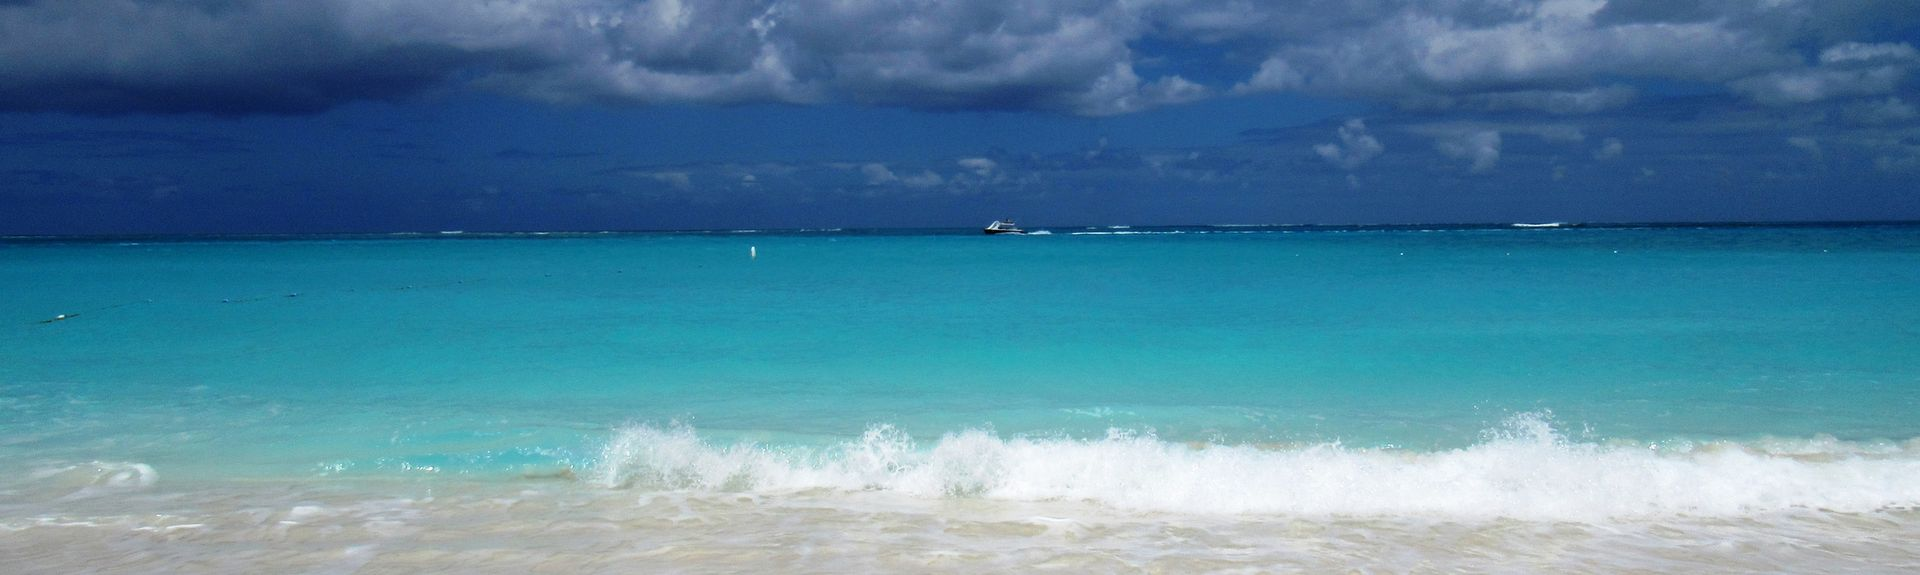 Villa Renaissance, Grace Bay, Turks and Caicos Islands